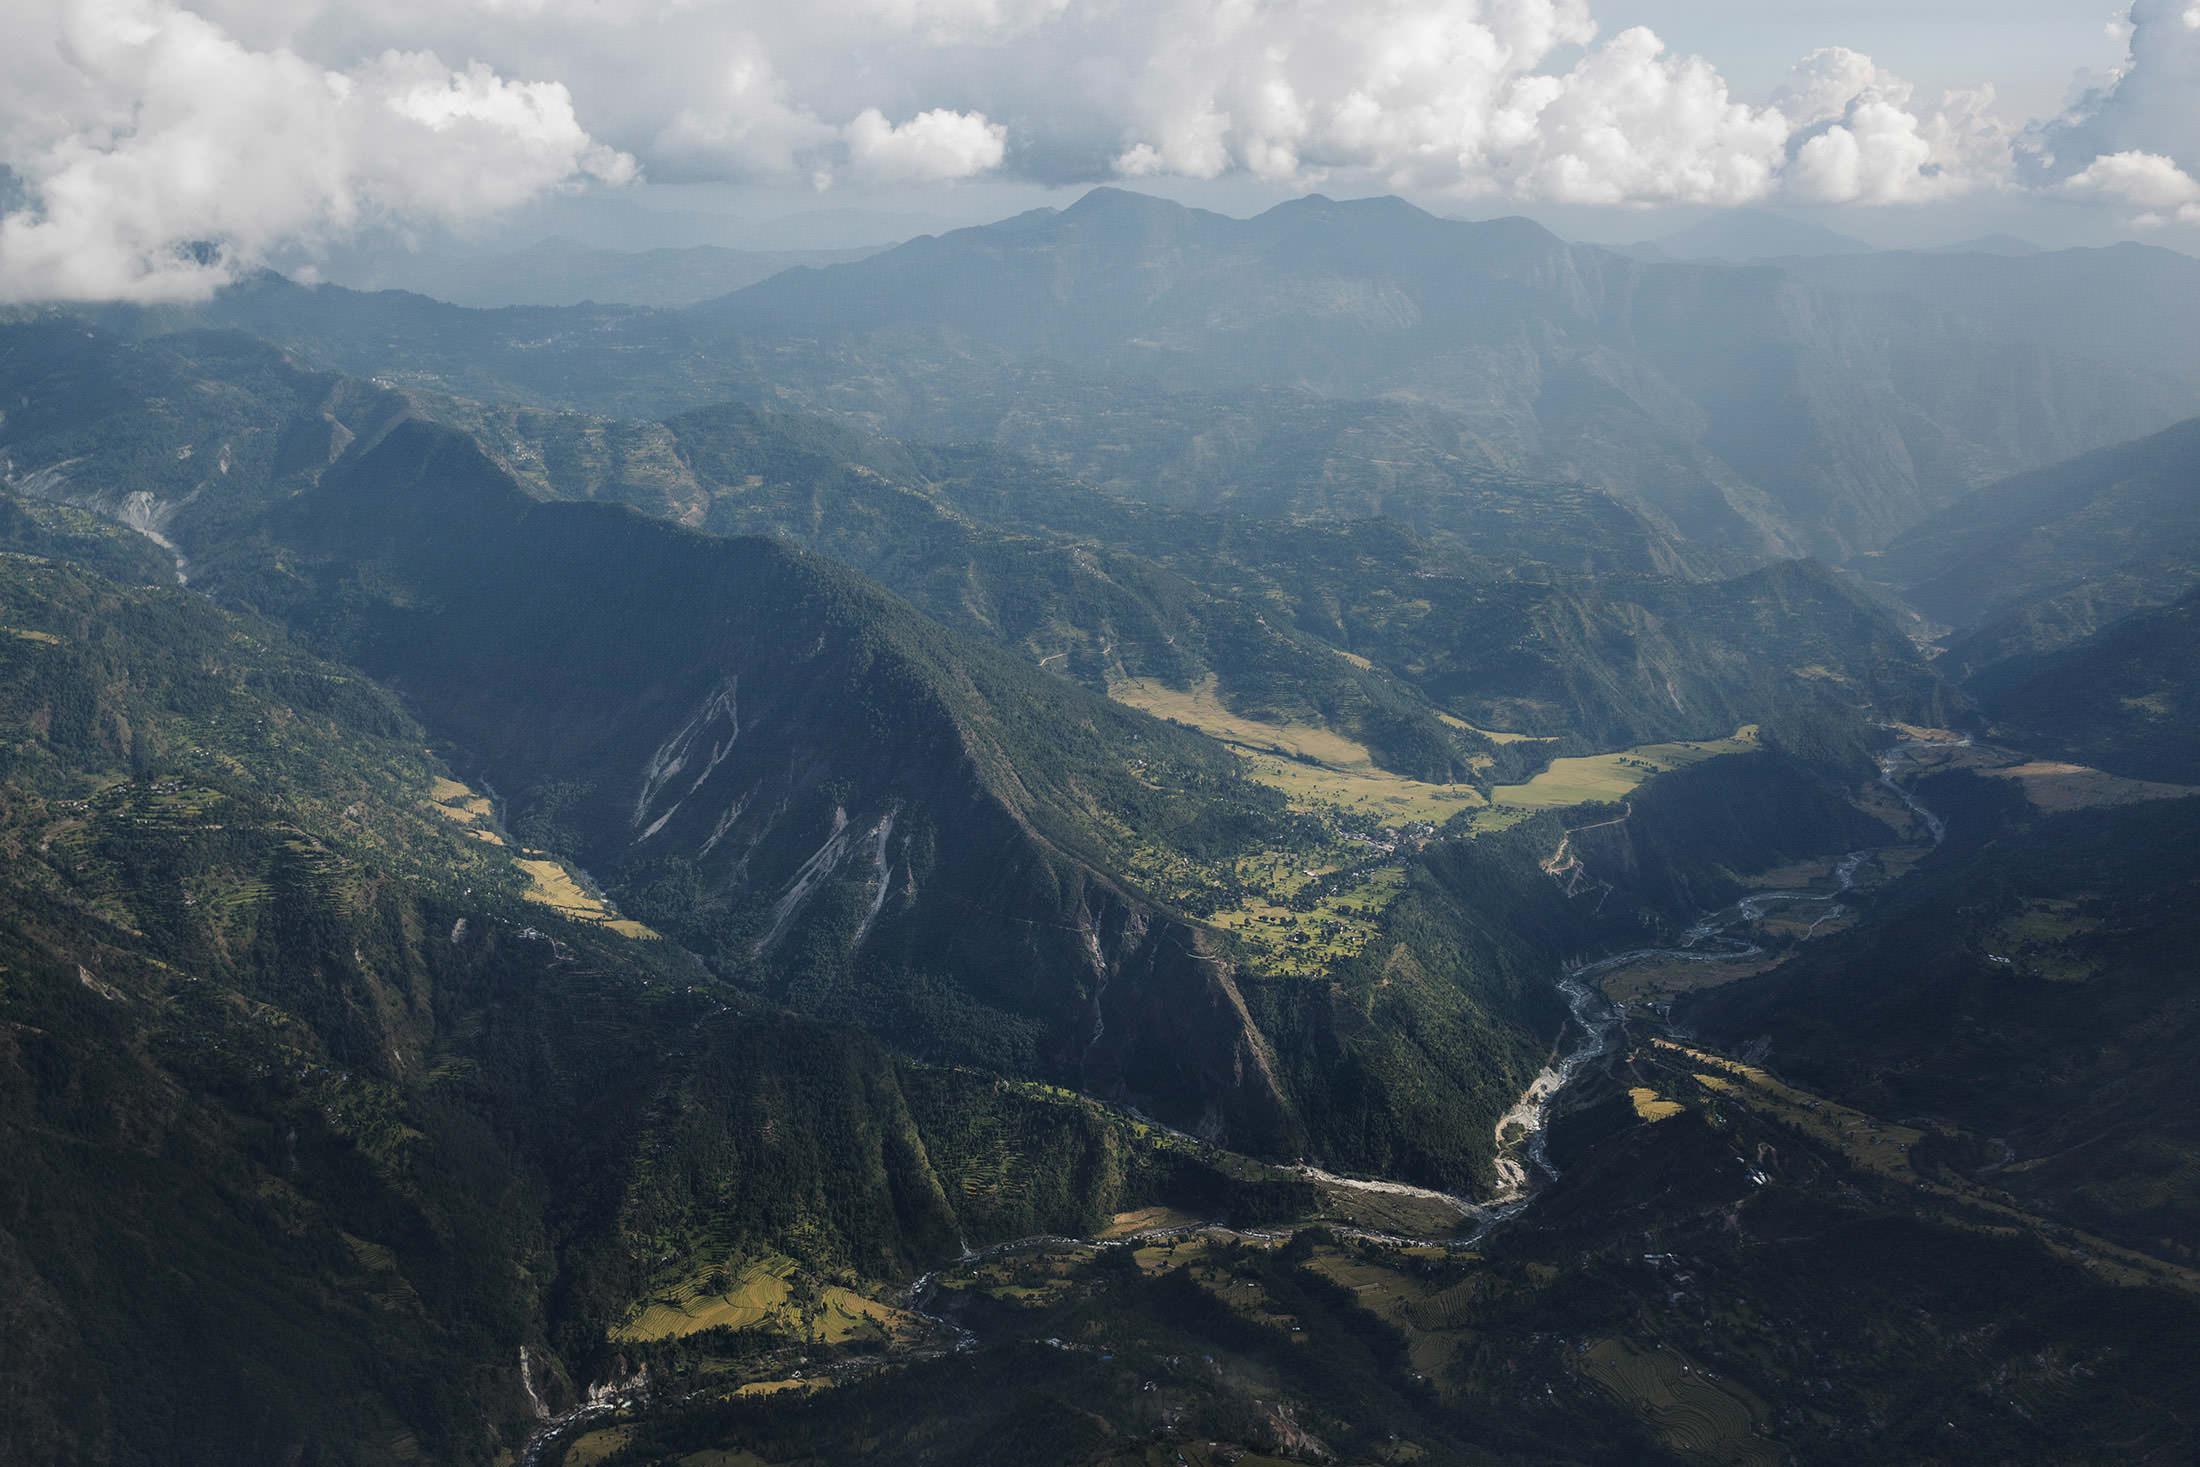 The Hongku River valley, looking toward the mountains of Solukhumbu.